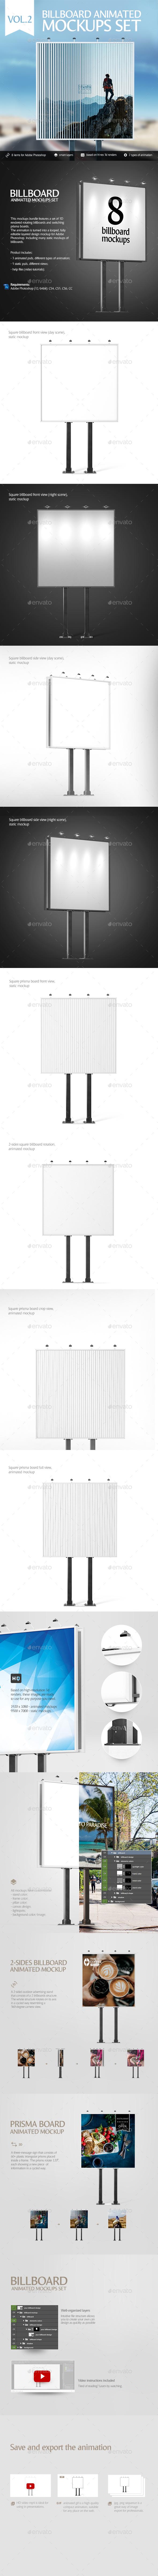 GraphicRiver Billboard Animated Mockups Set Vol.2 20371308